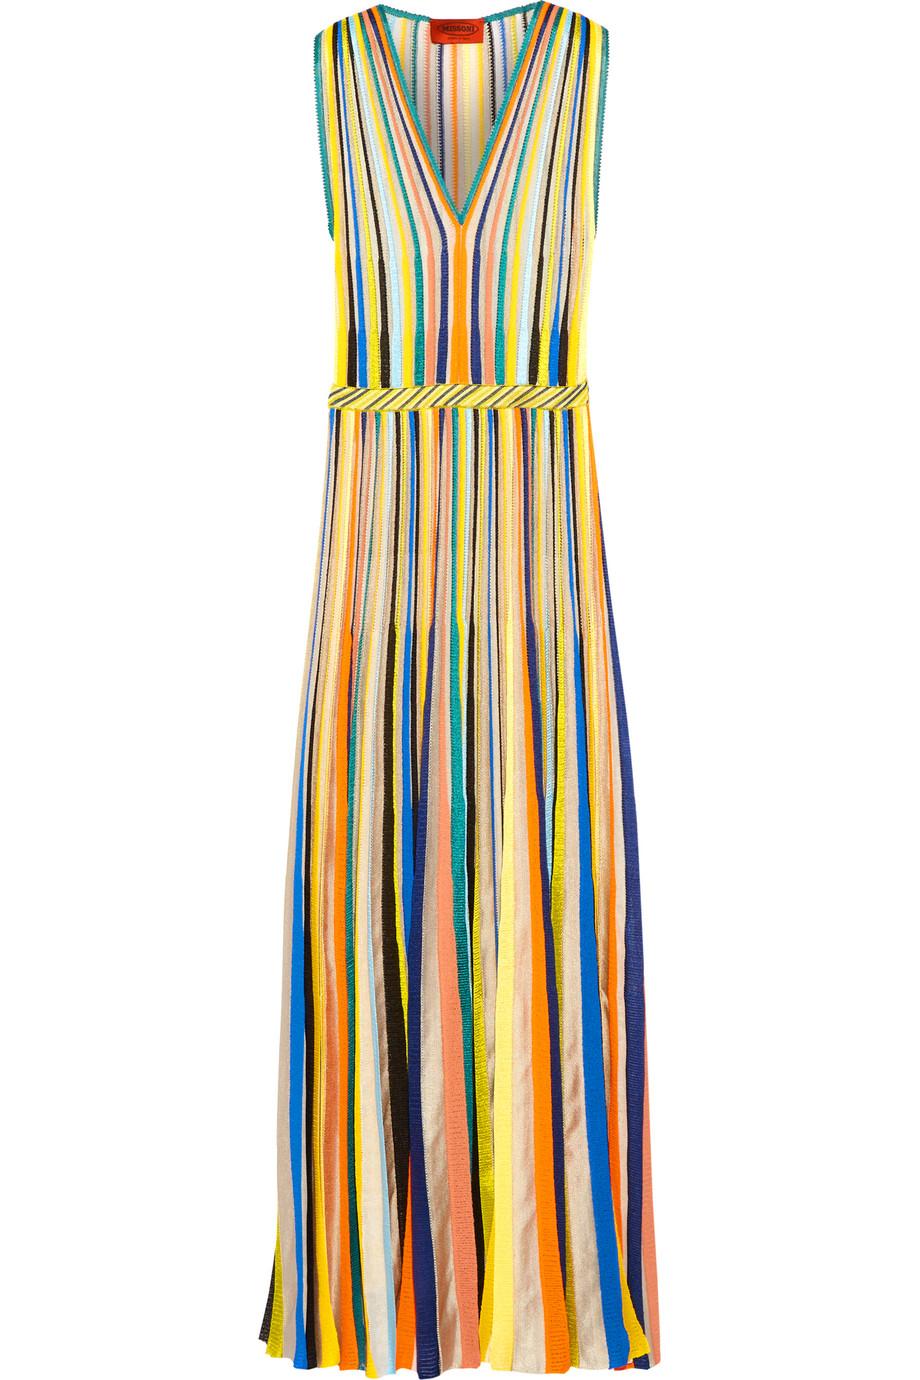 Missoni Striped Crochet-Knit Maxi Dress, Green/Yellow, Women's, Size: 42